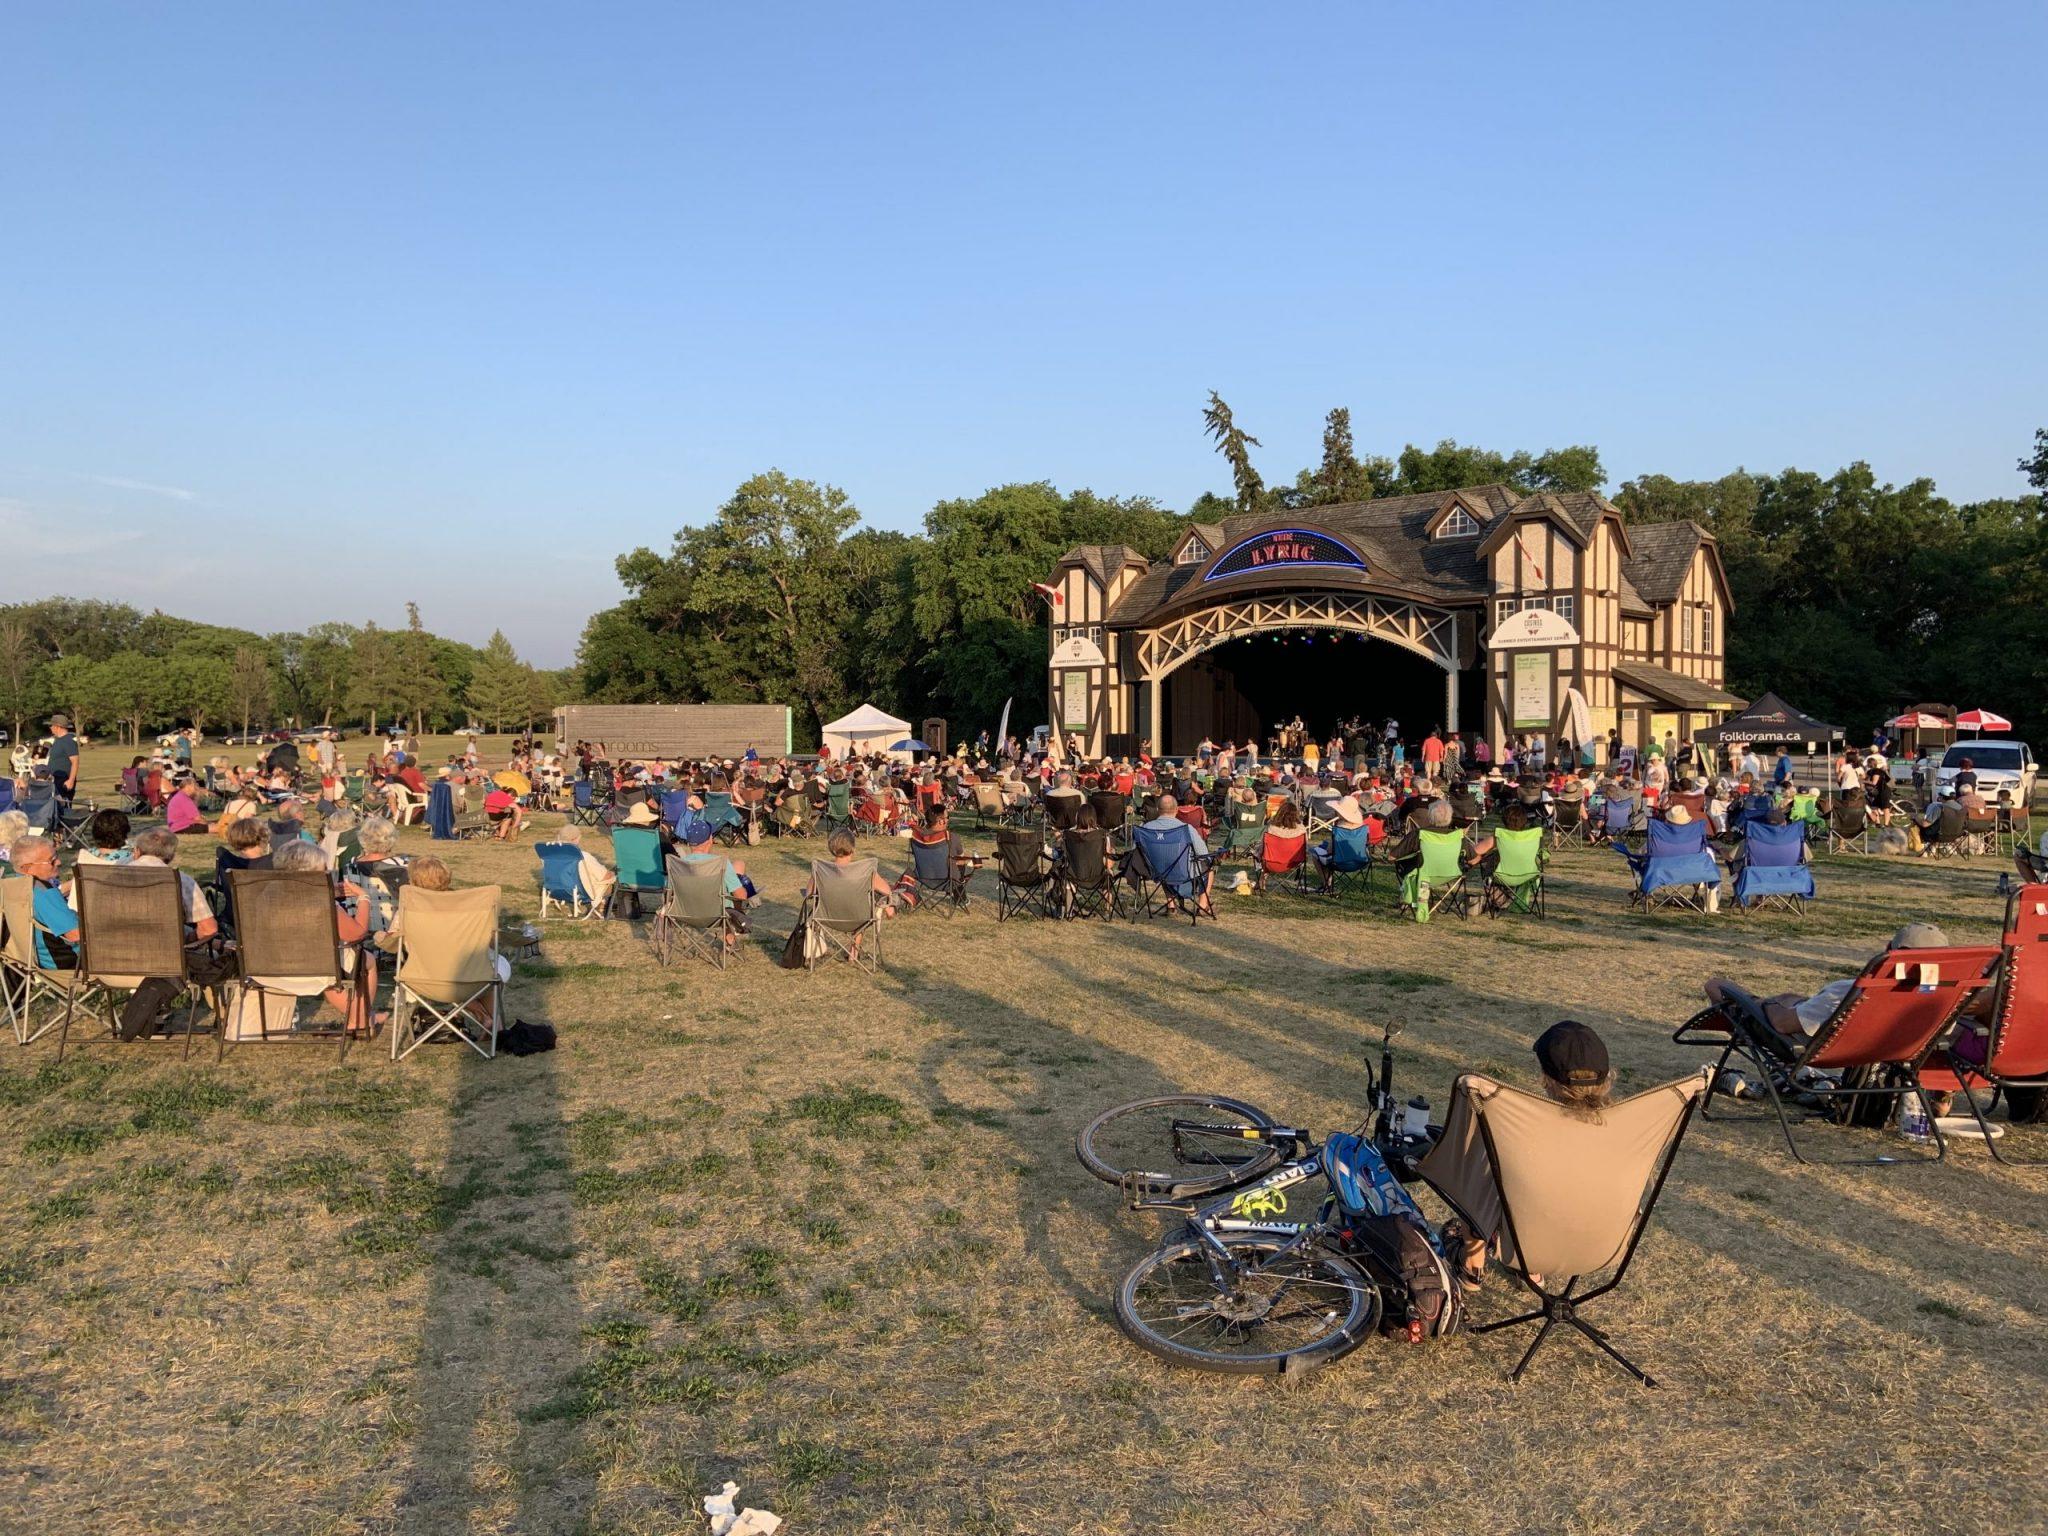 A photo of a summer concert at Assiniboine Park